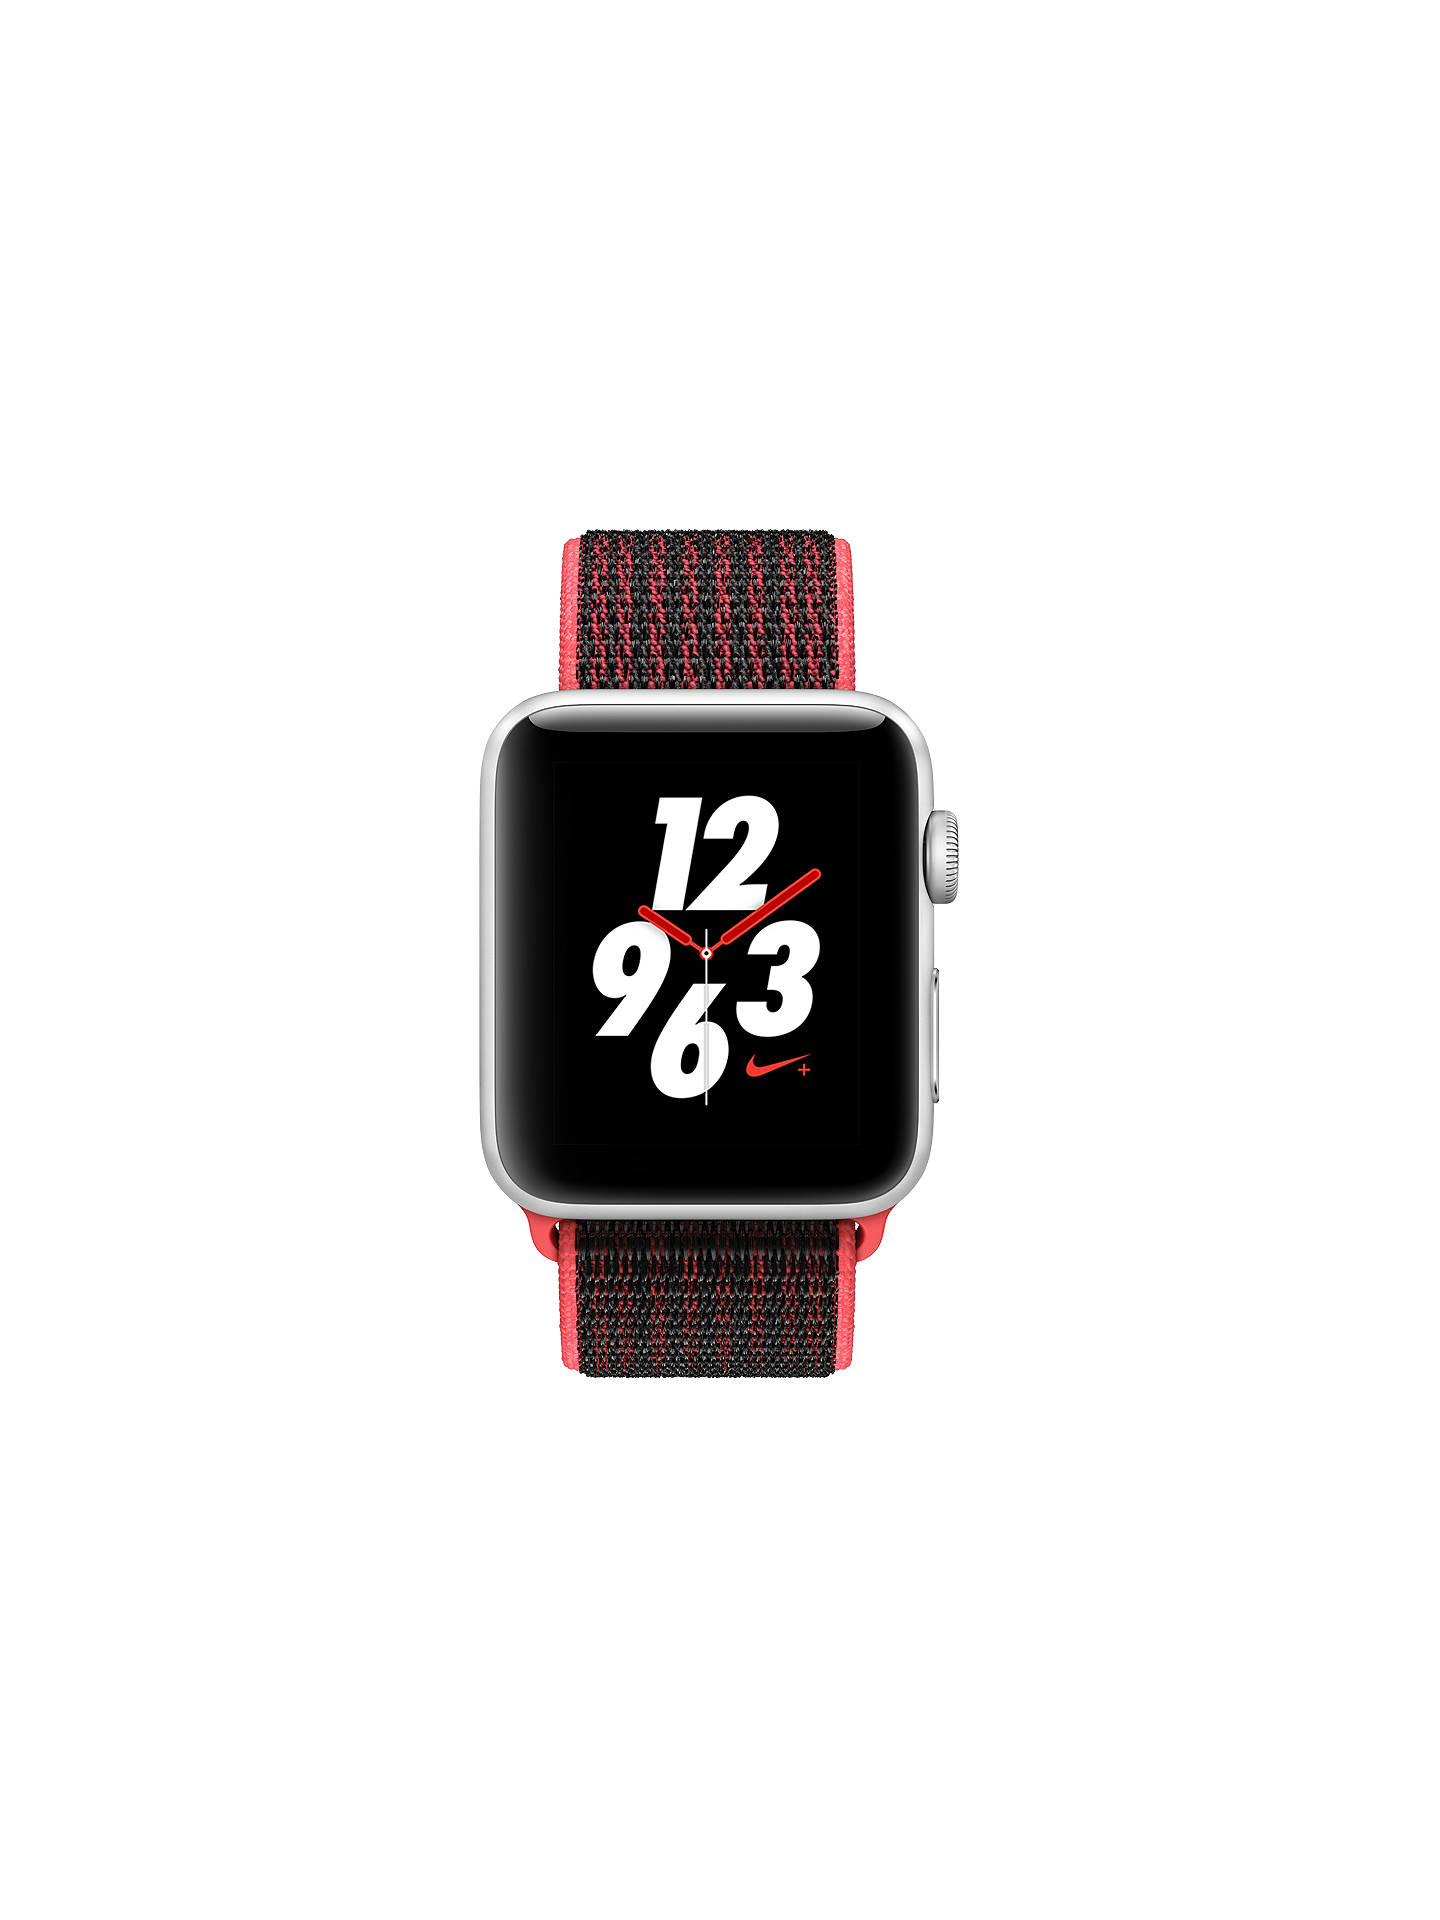 En honor prima Negociar  Apple Watch Nike+ Series 3, GPS and Cellular, 42mm Silver Aluminium Case  with Nike Sport Loop, Bright Crimson / Black at John Lewis & Partners